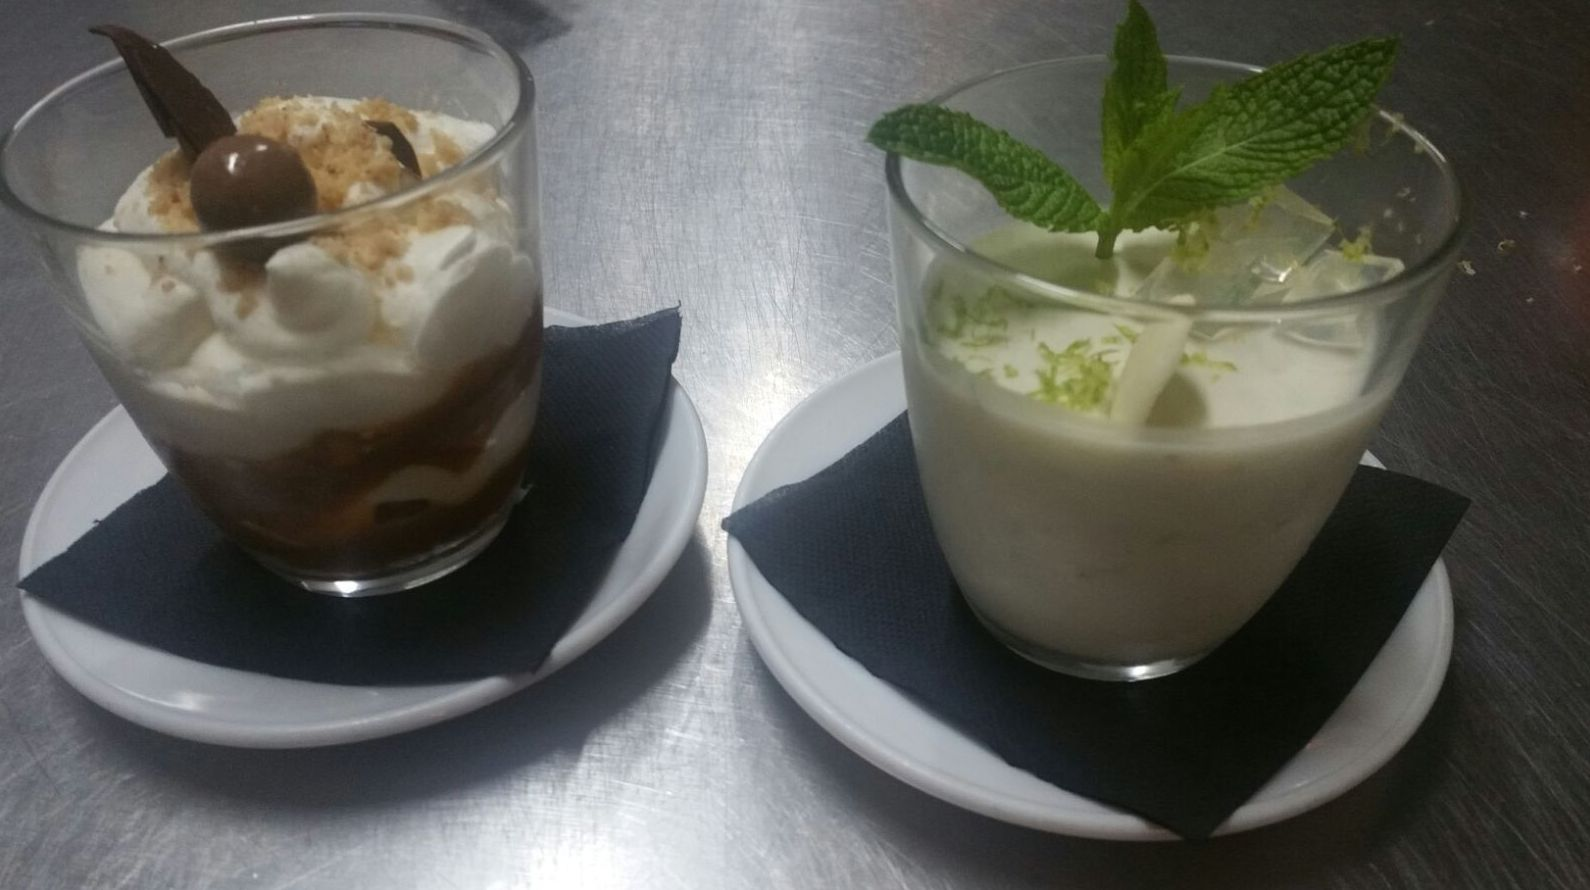 Foto 32 de Restaurante en Santa Cruz de Tenerife | Restaurante La Ksona